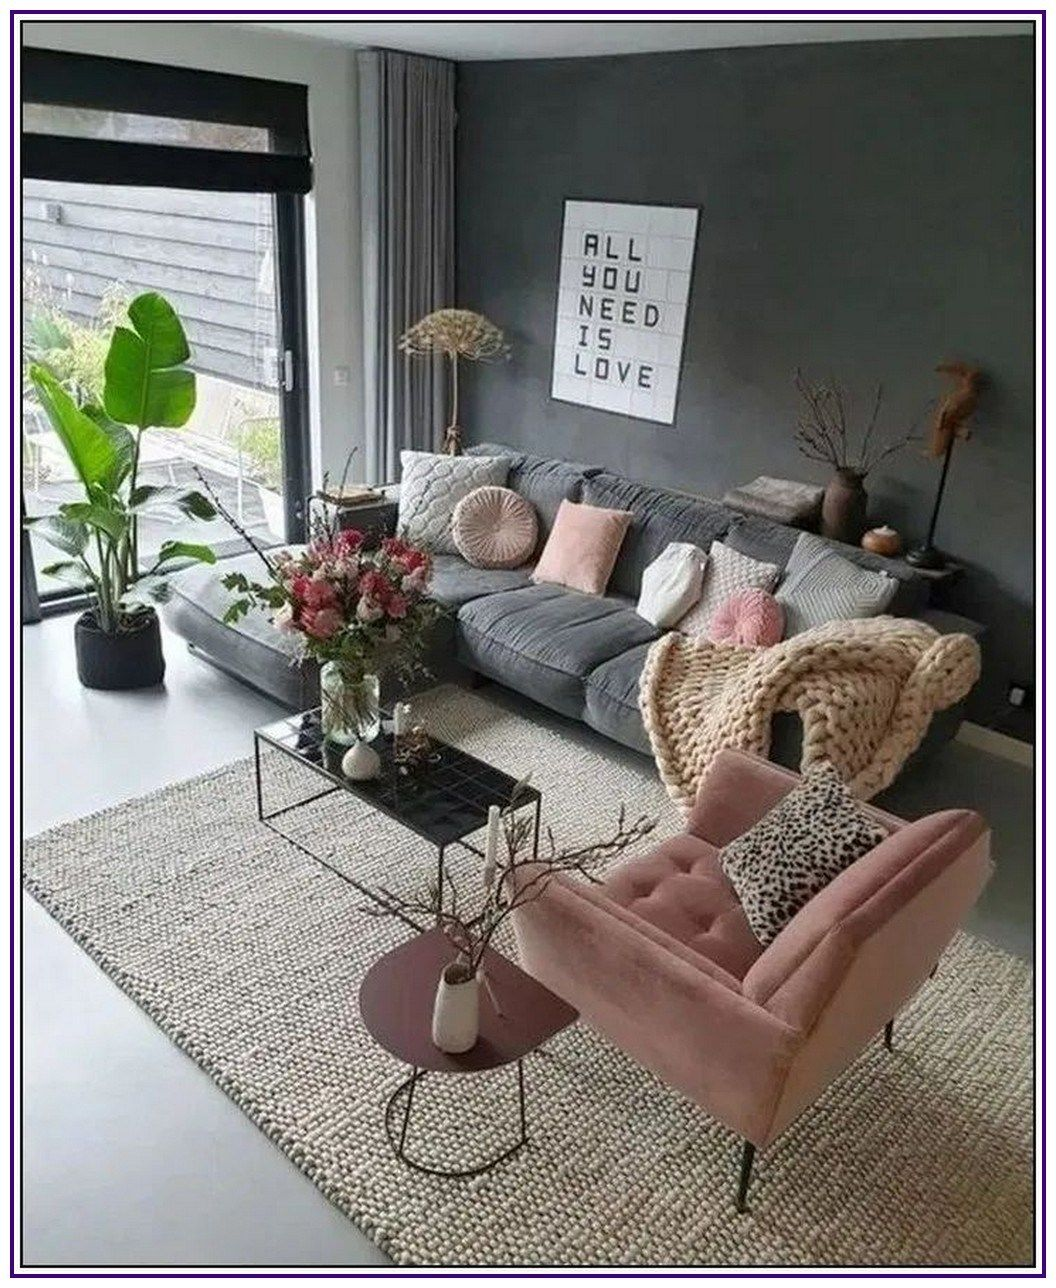 14 Attractive Living Room Wall Decor Ideas 00014 Winzipdownload Org In 2020 Interior Design Living Room Warm Living Room Decor Modern Living Room Decor Cozy